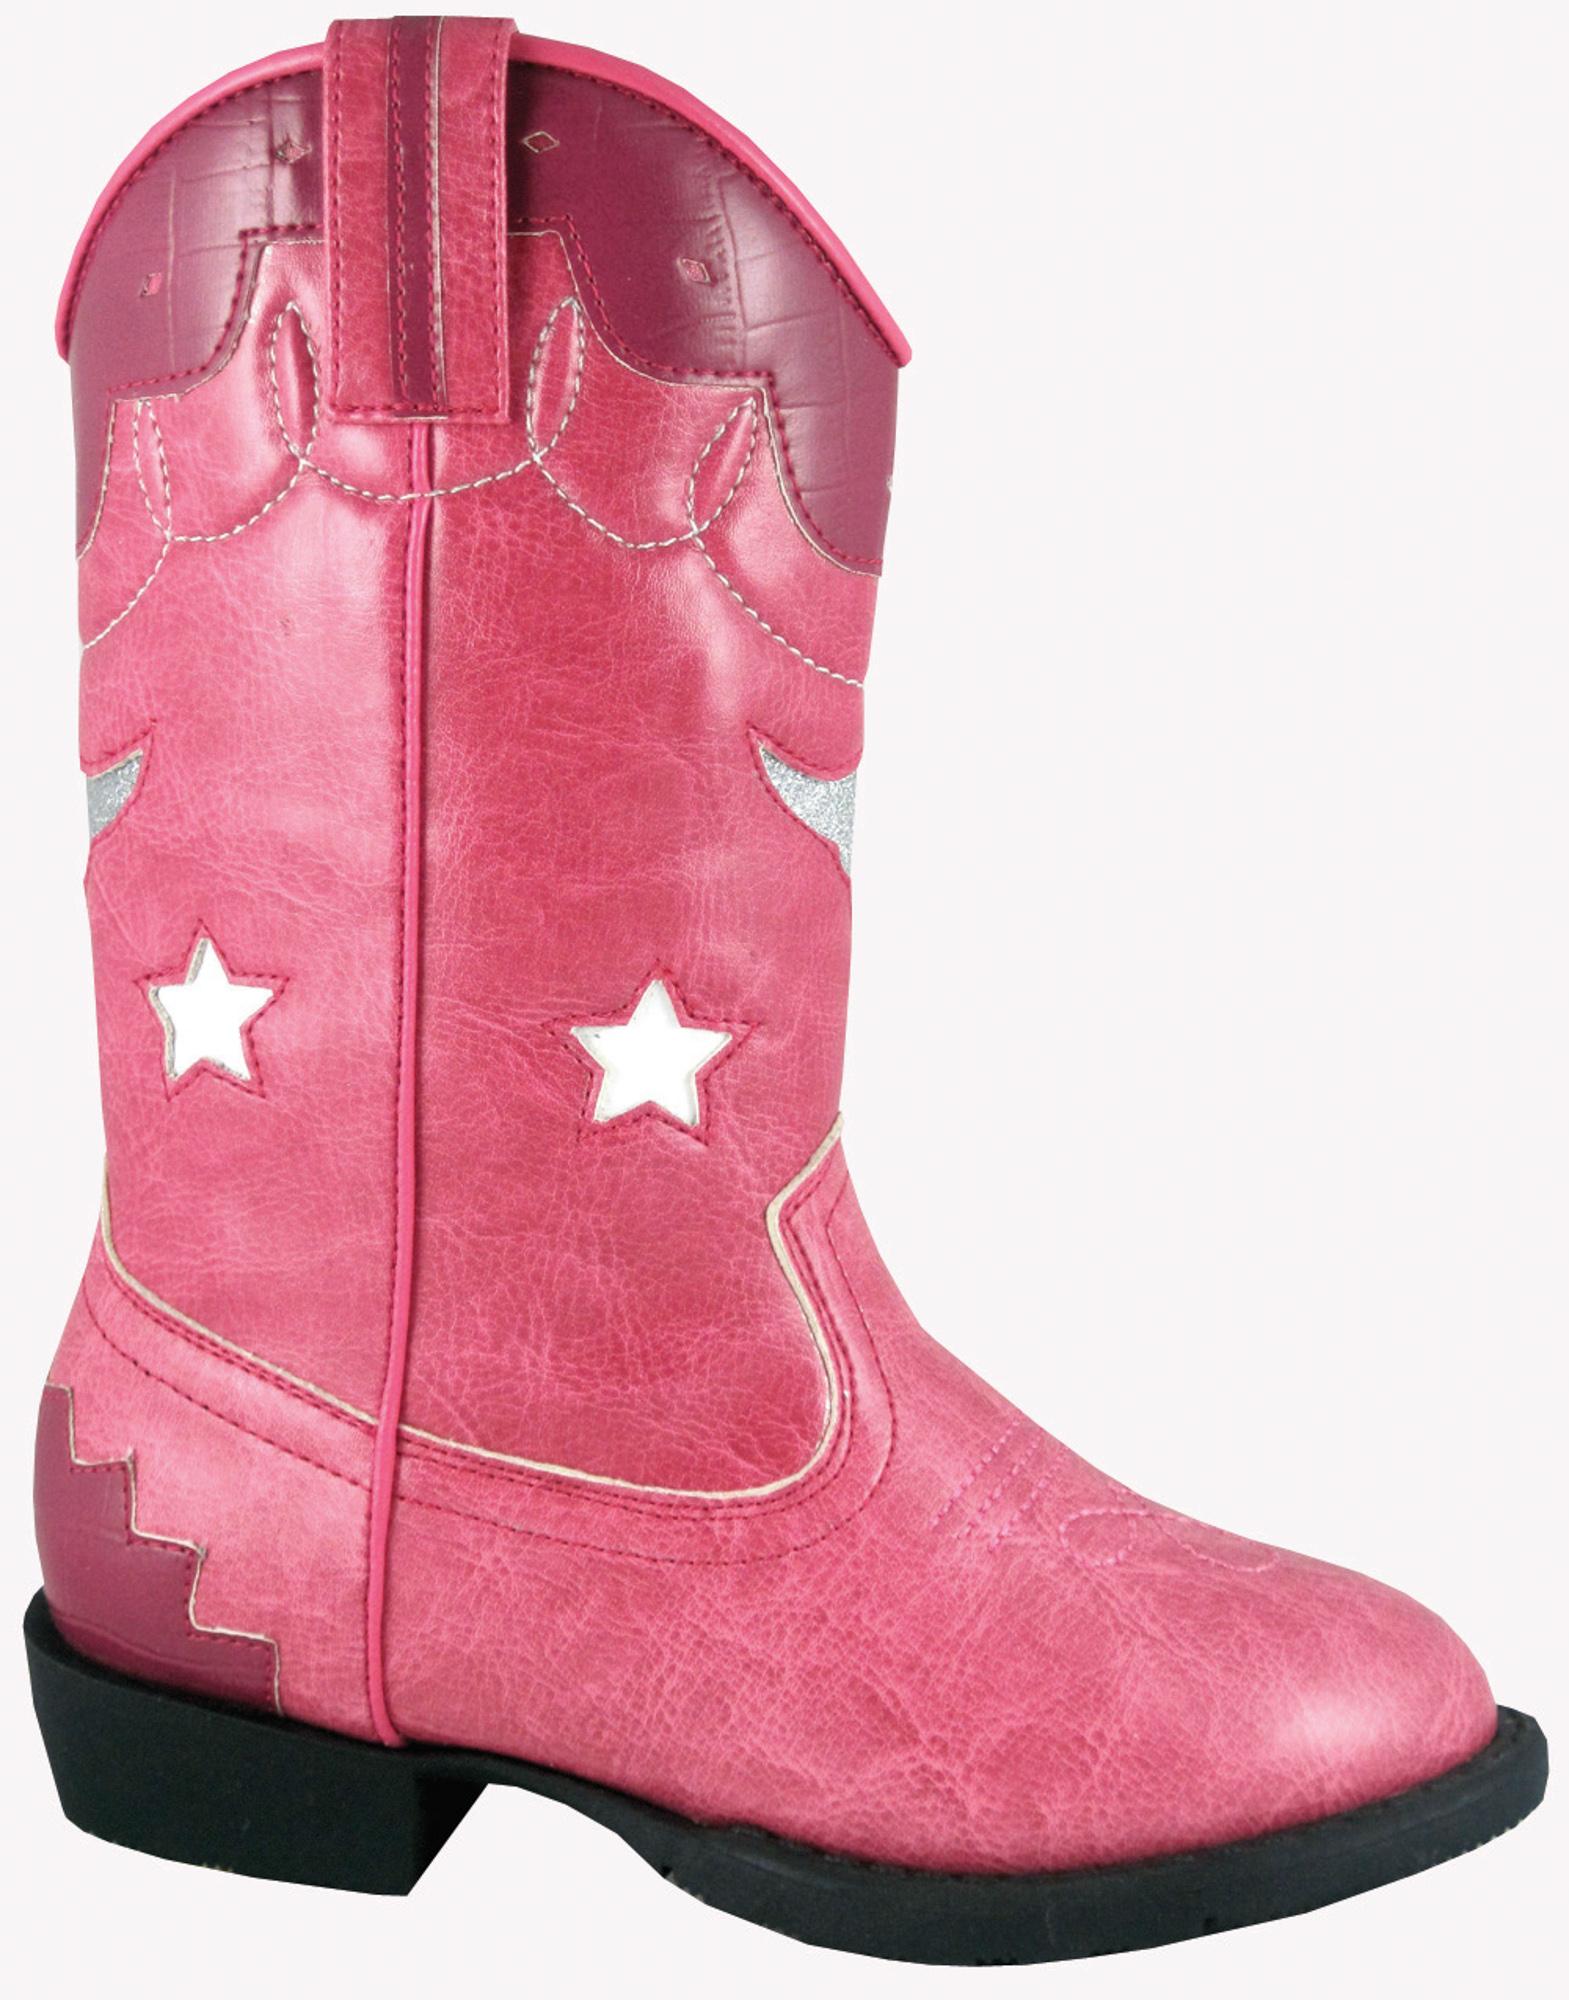 Toddler Cowboy Boots Deals On 1001 Blocks